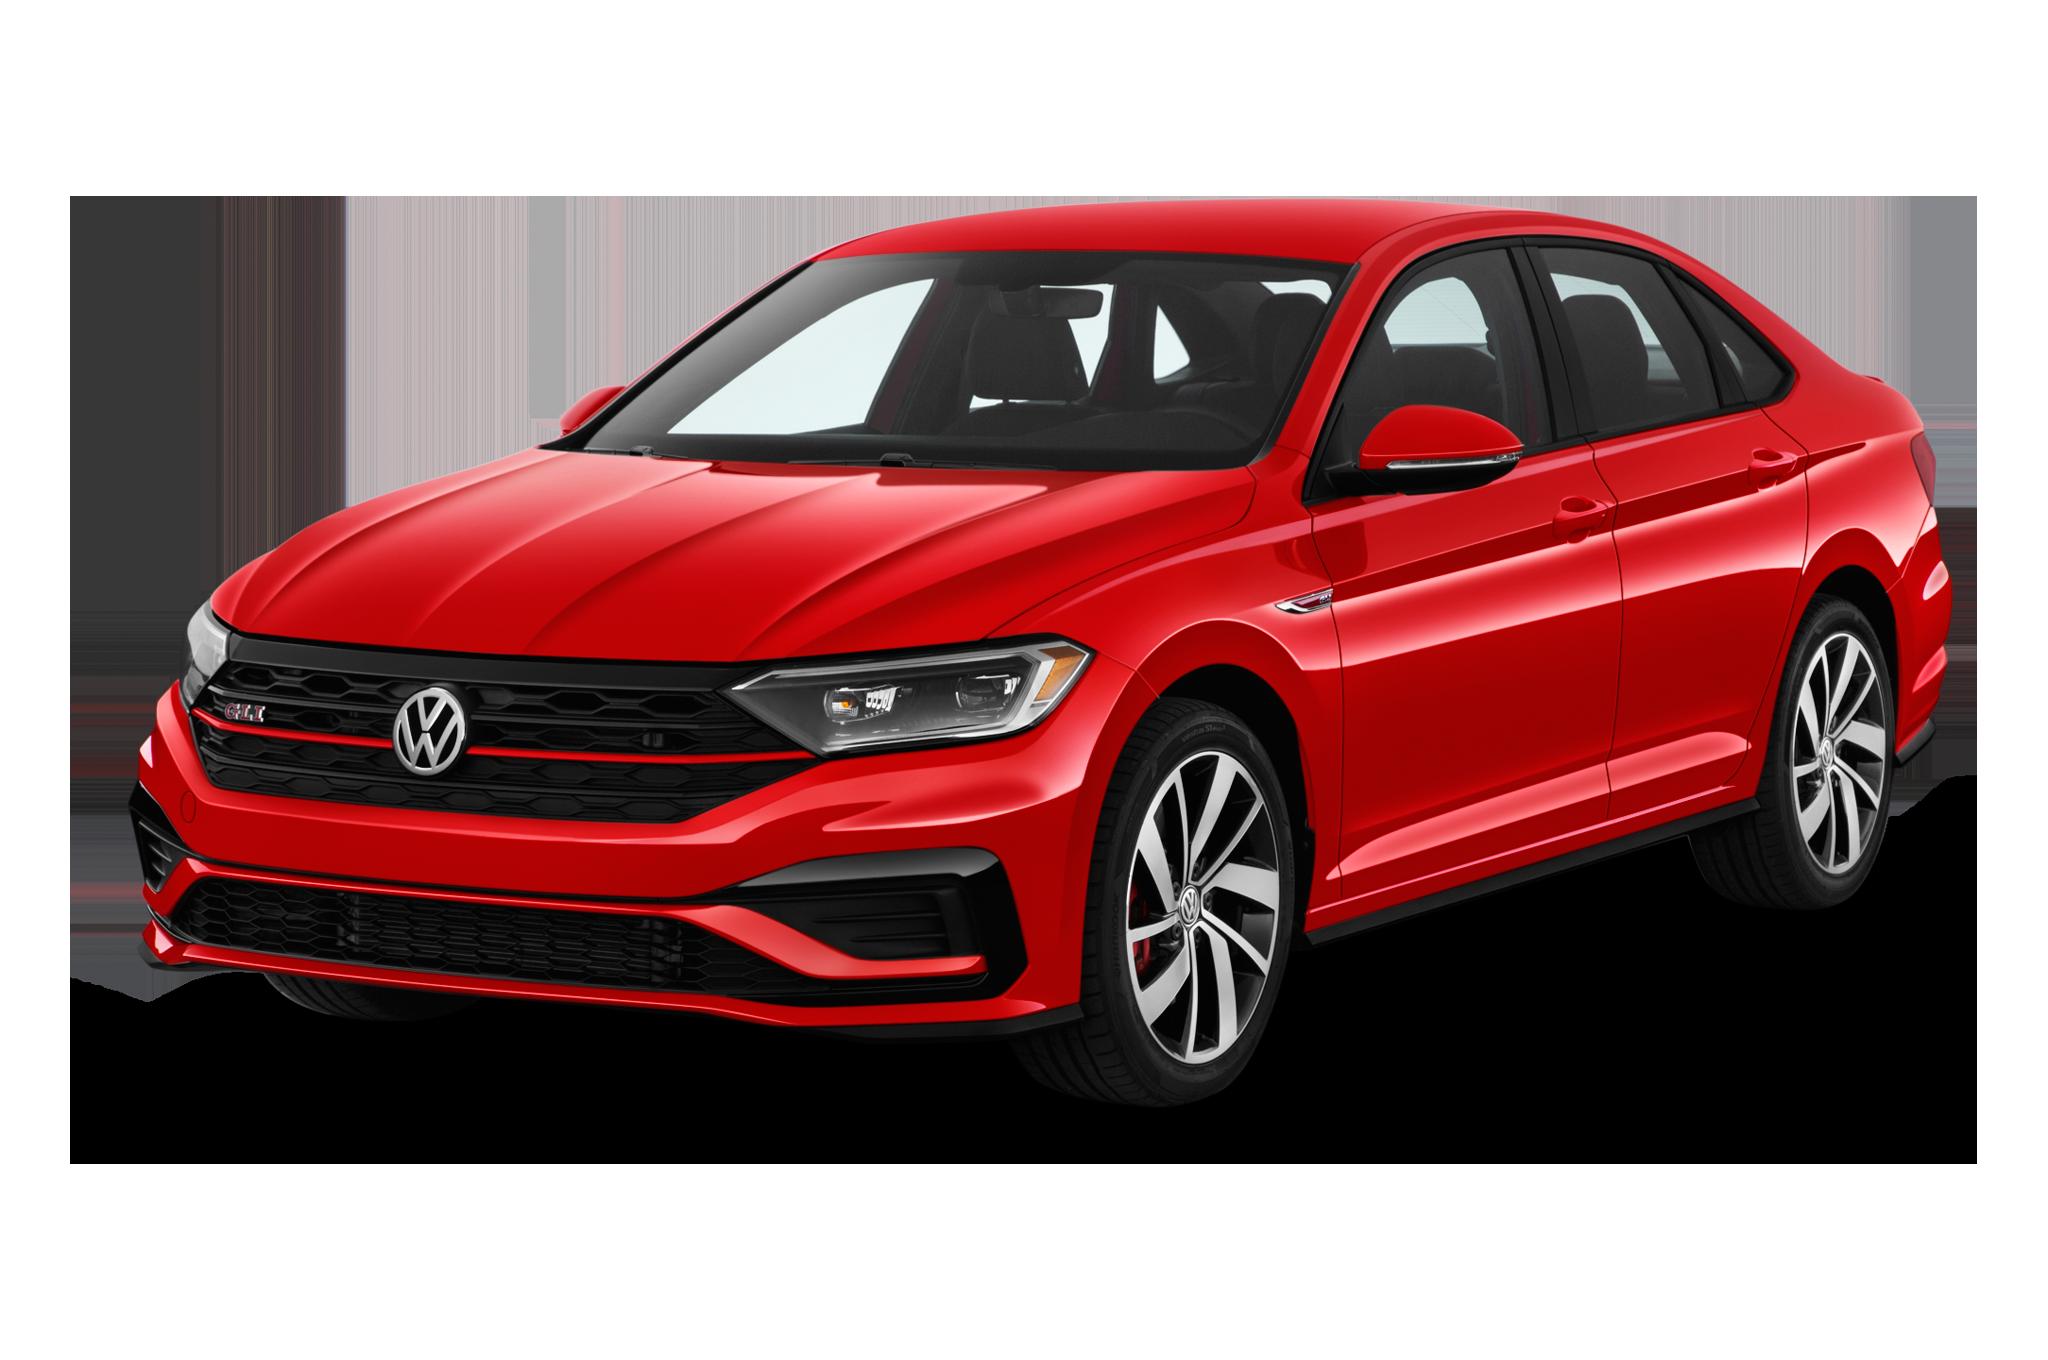 2019 Volkswagen Jetta 2.0T GLI S Specs and Features - MSN ...